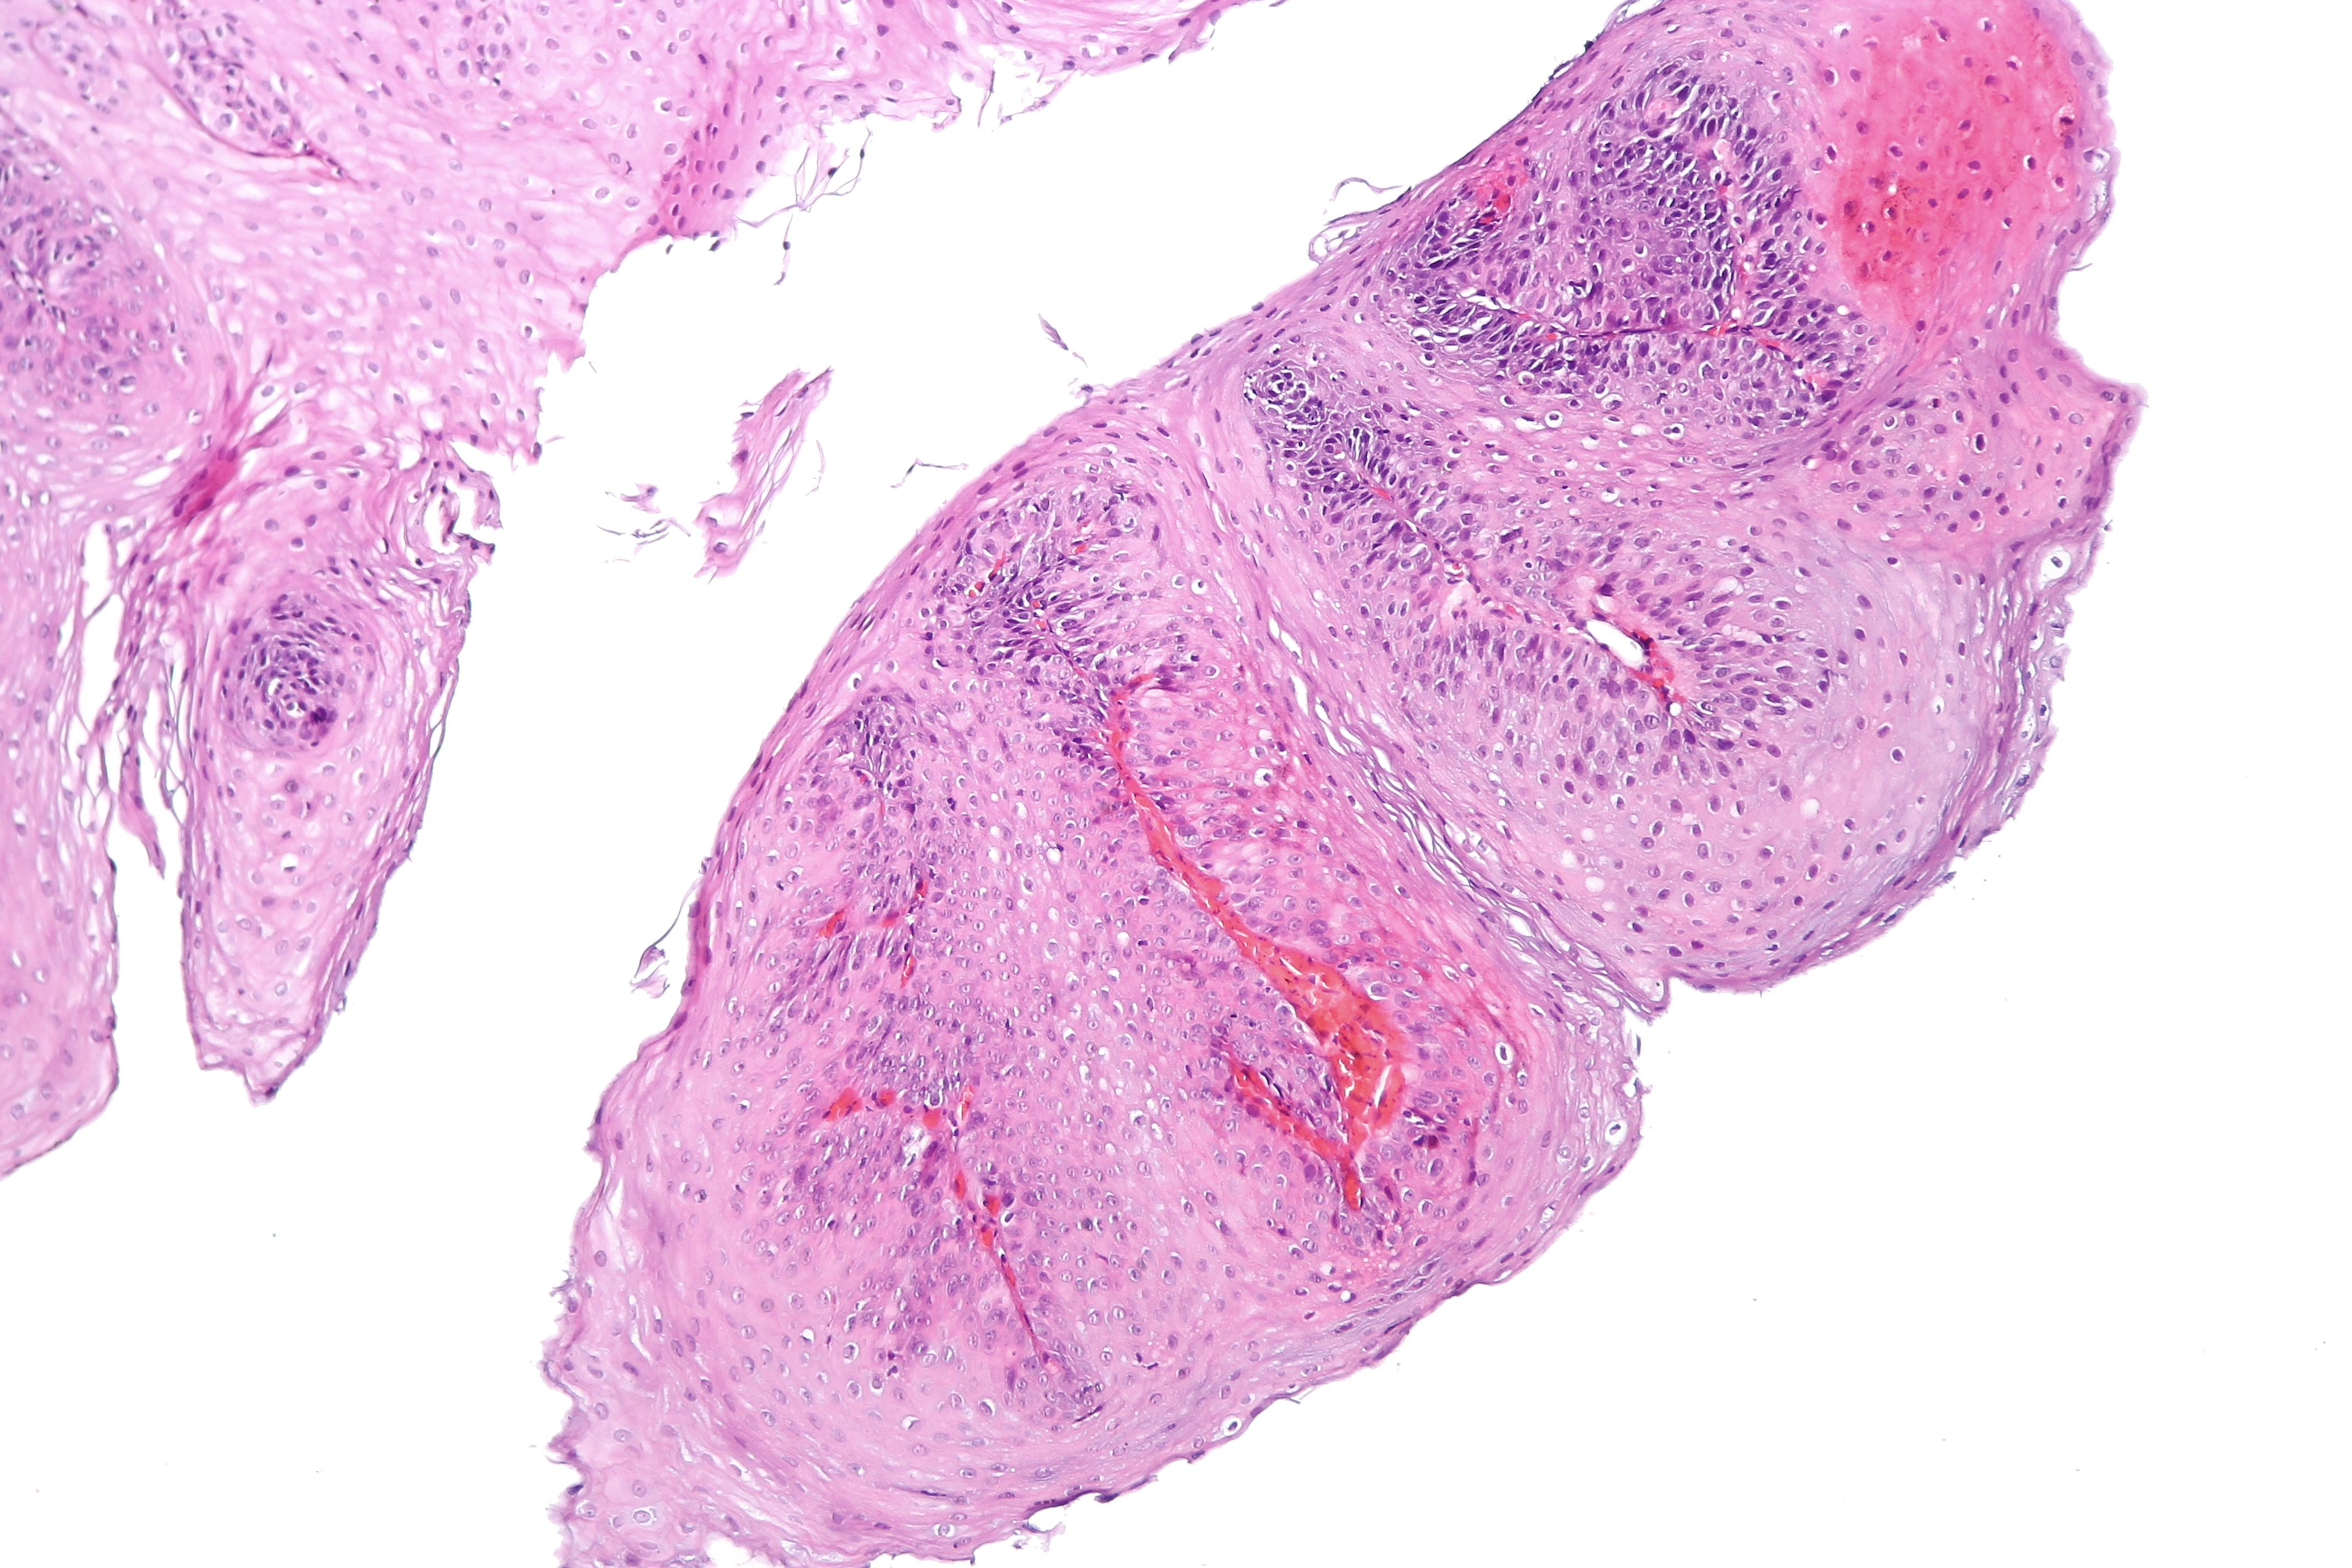 cancer pulmonar antofagasta